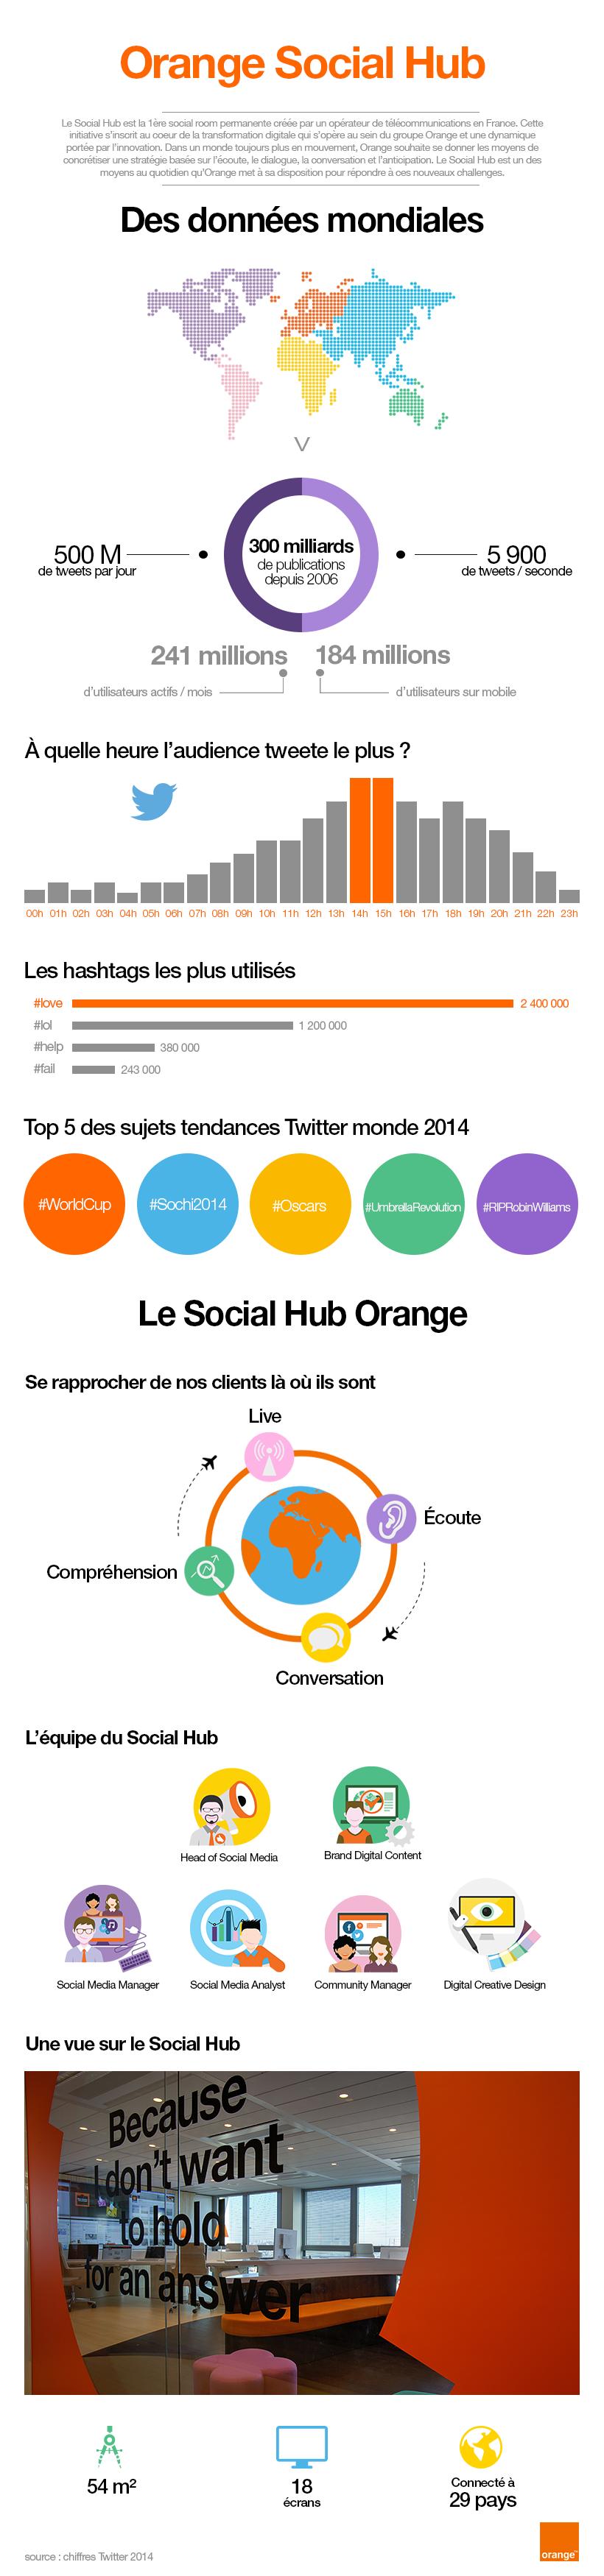 Orange Social Hub - infographie_V3